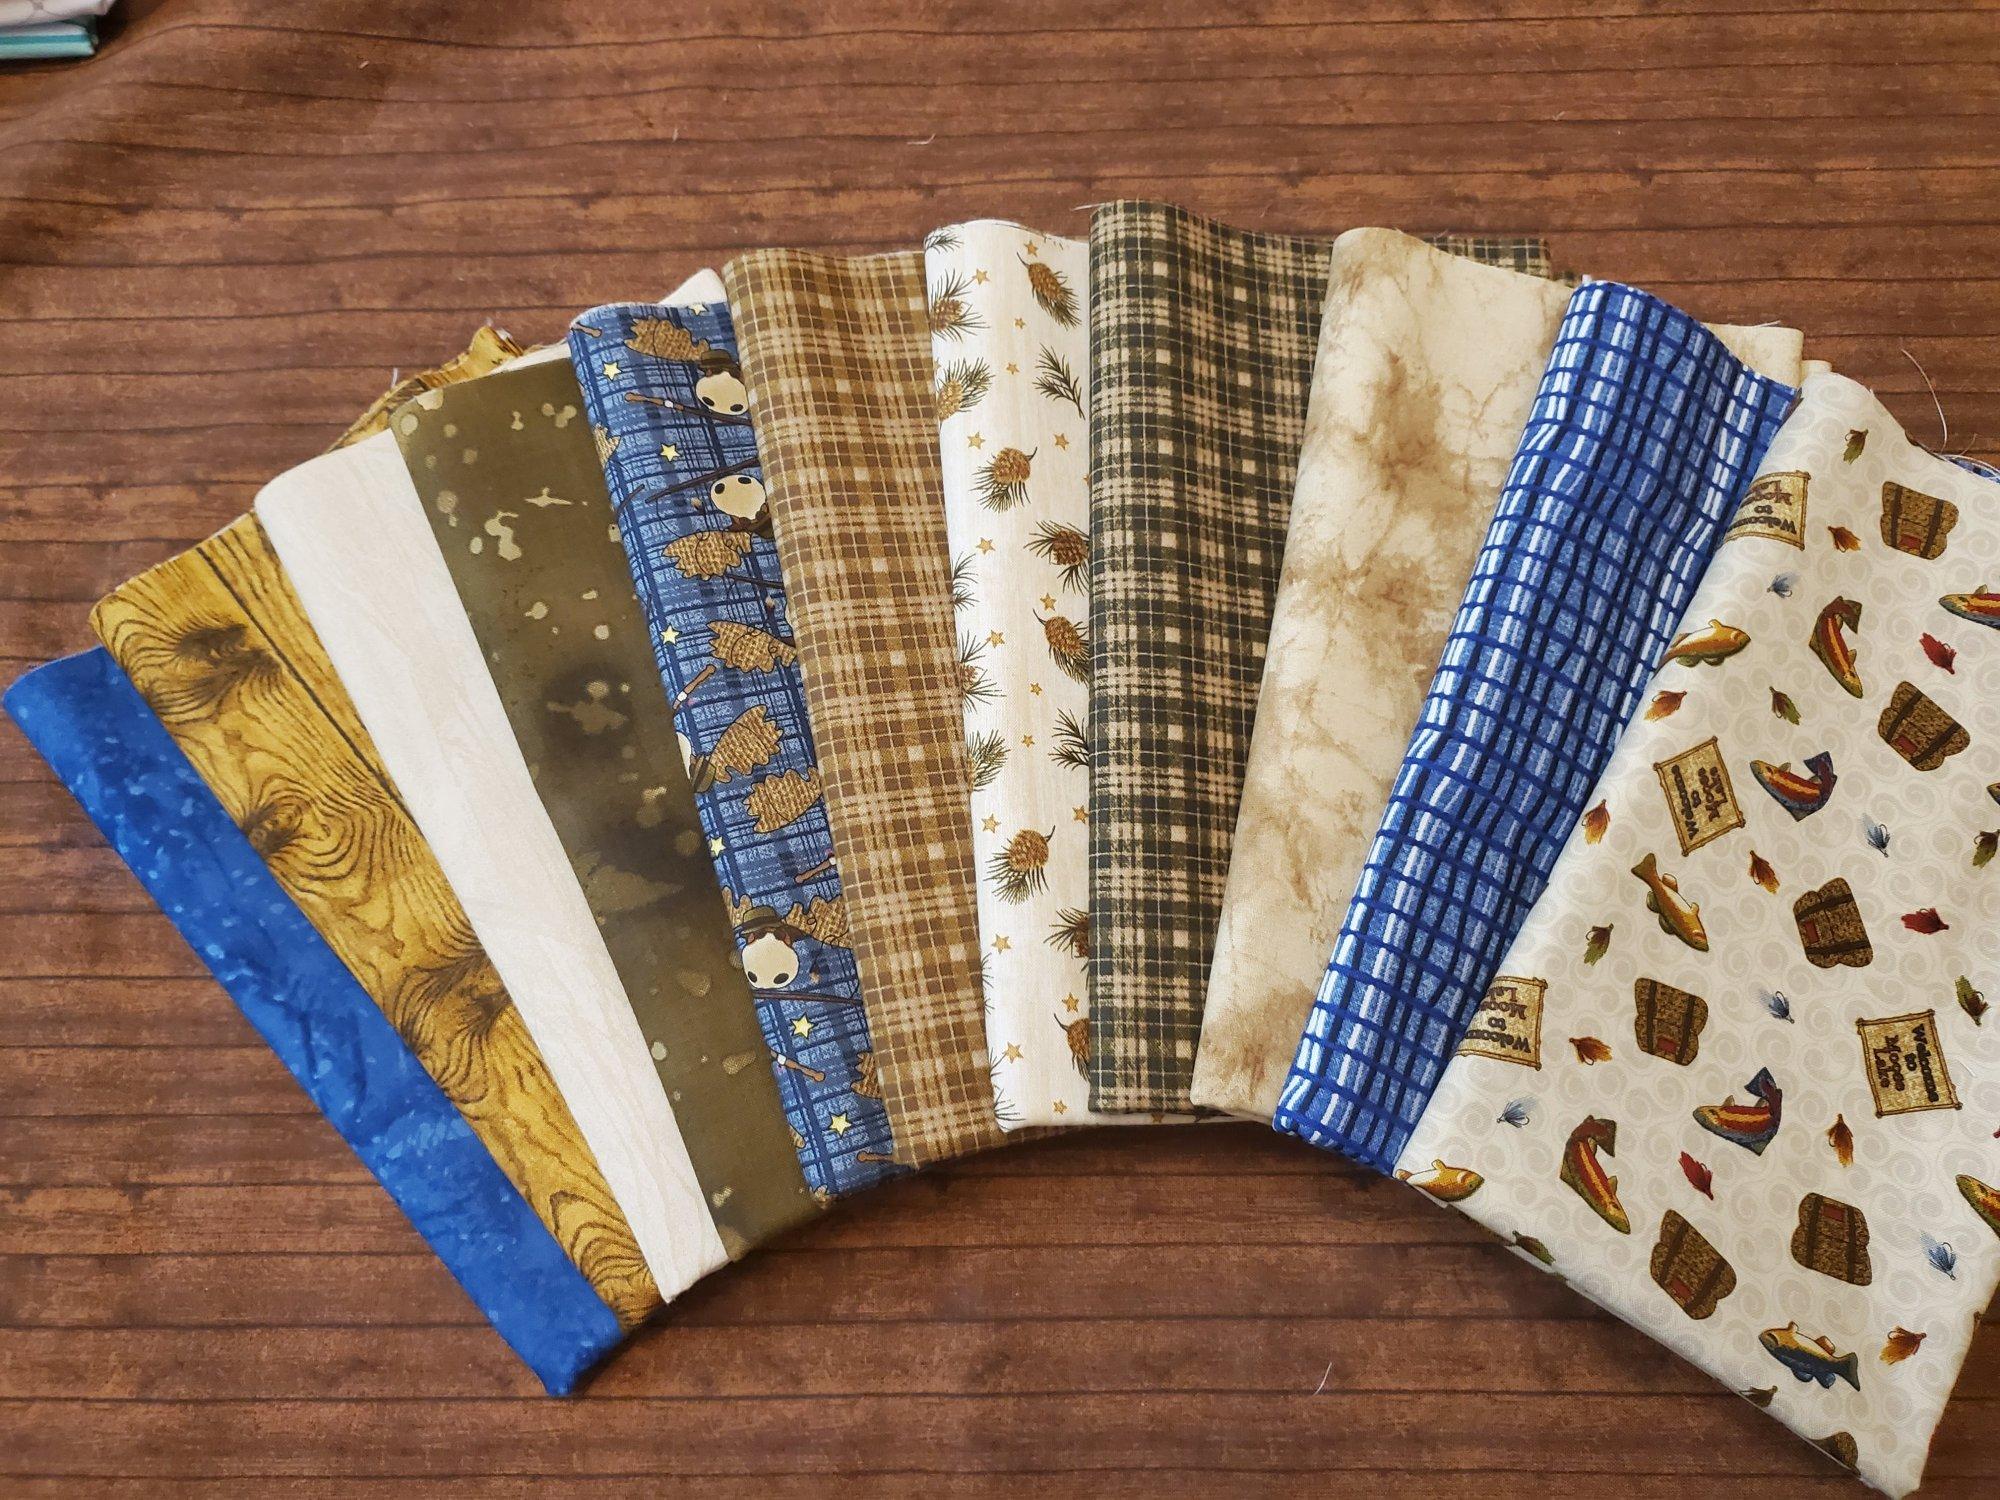 Moose Lake by Cheryl Haynes for Benartex - 11 Piece Half Yard Bundle Pack